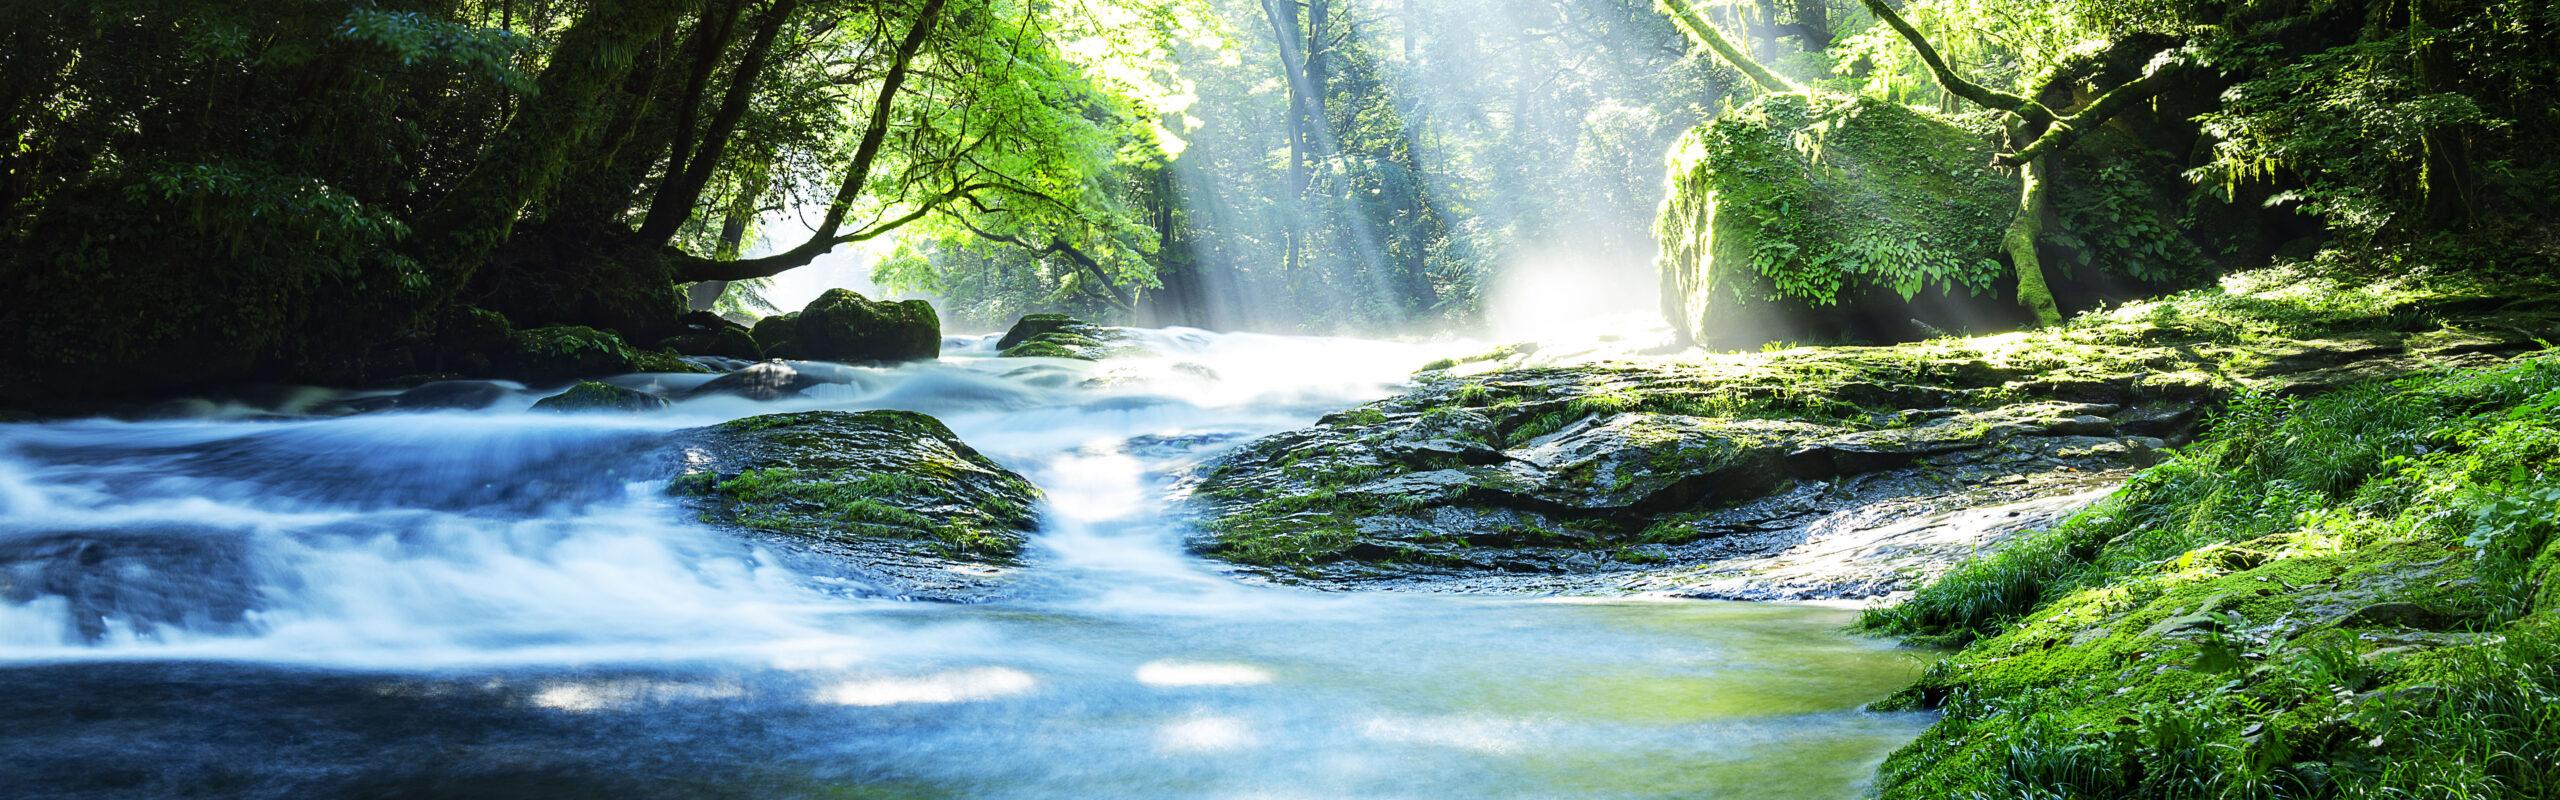 A clean river flows through a vibrant, green forest